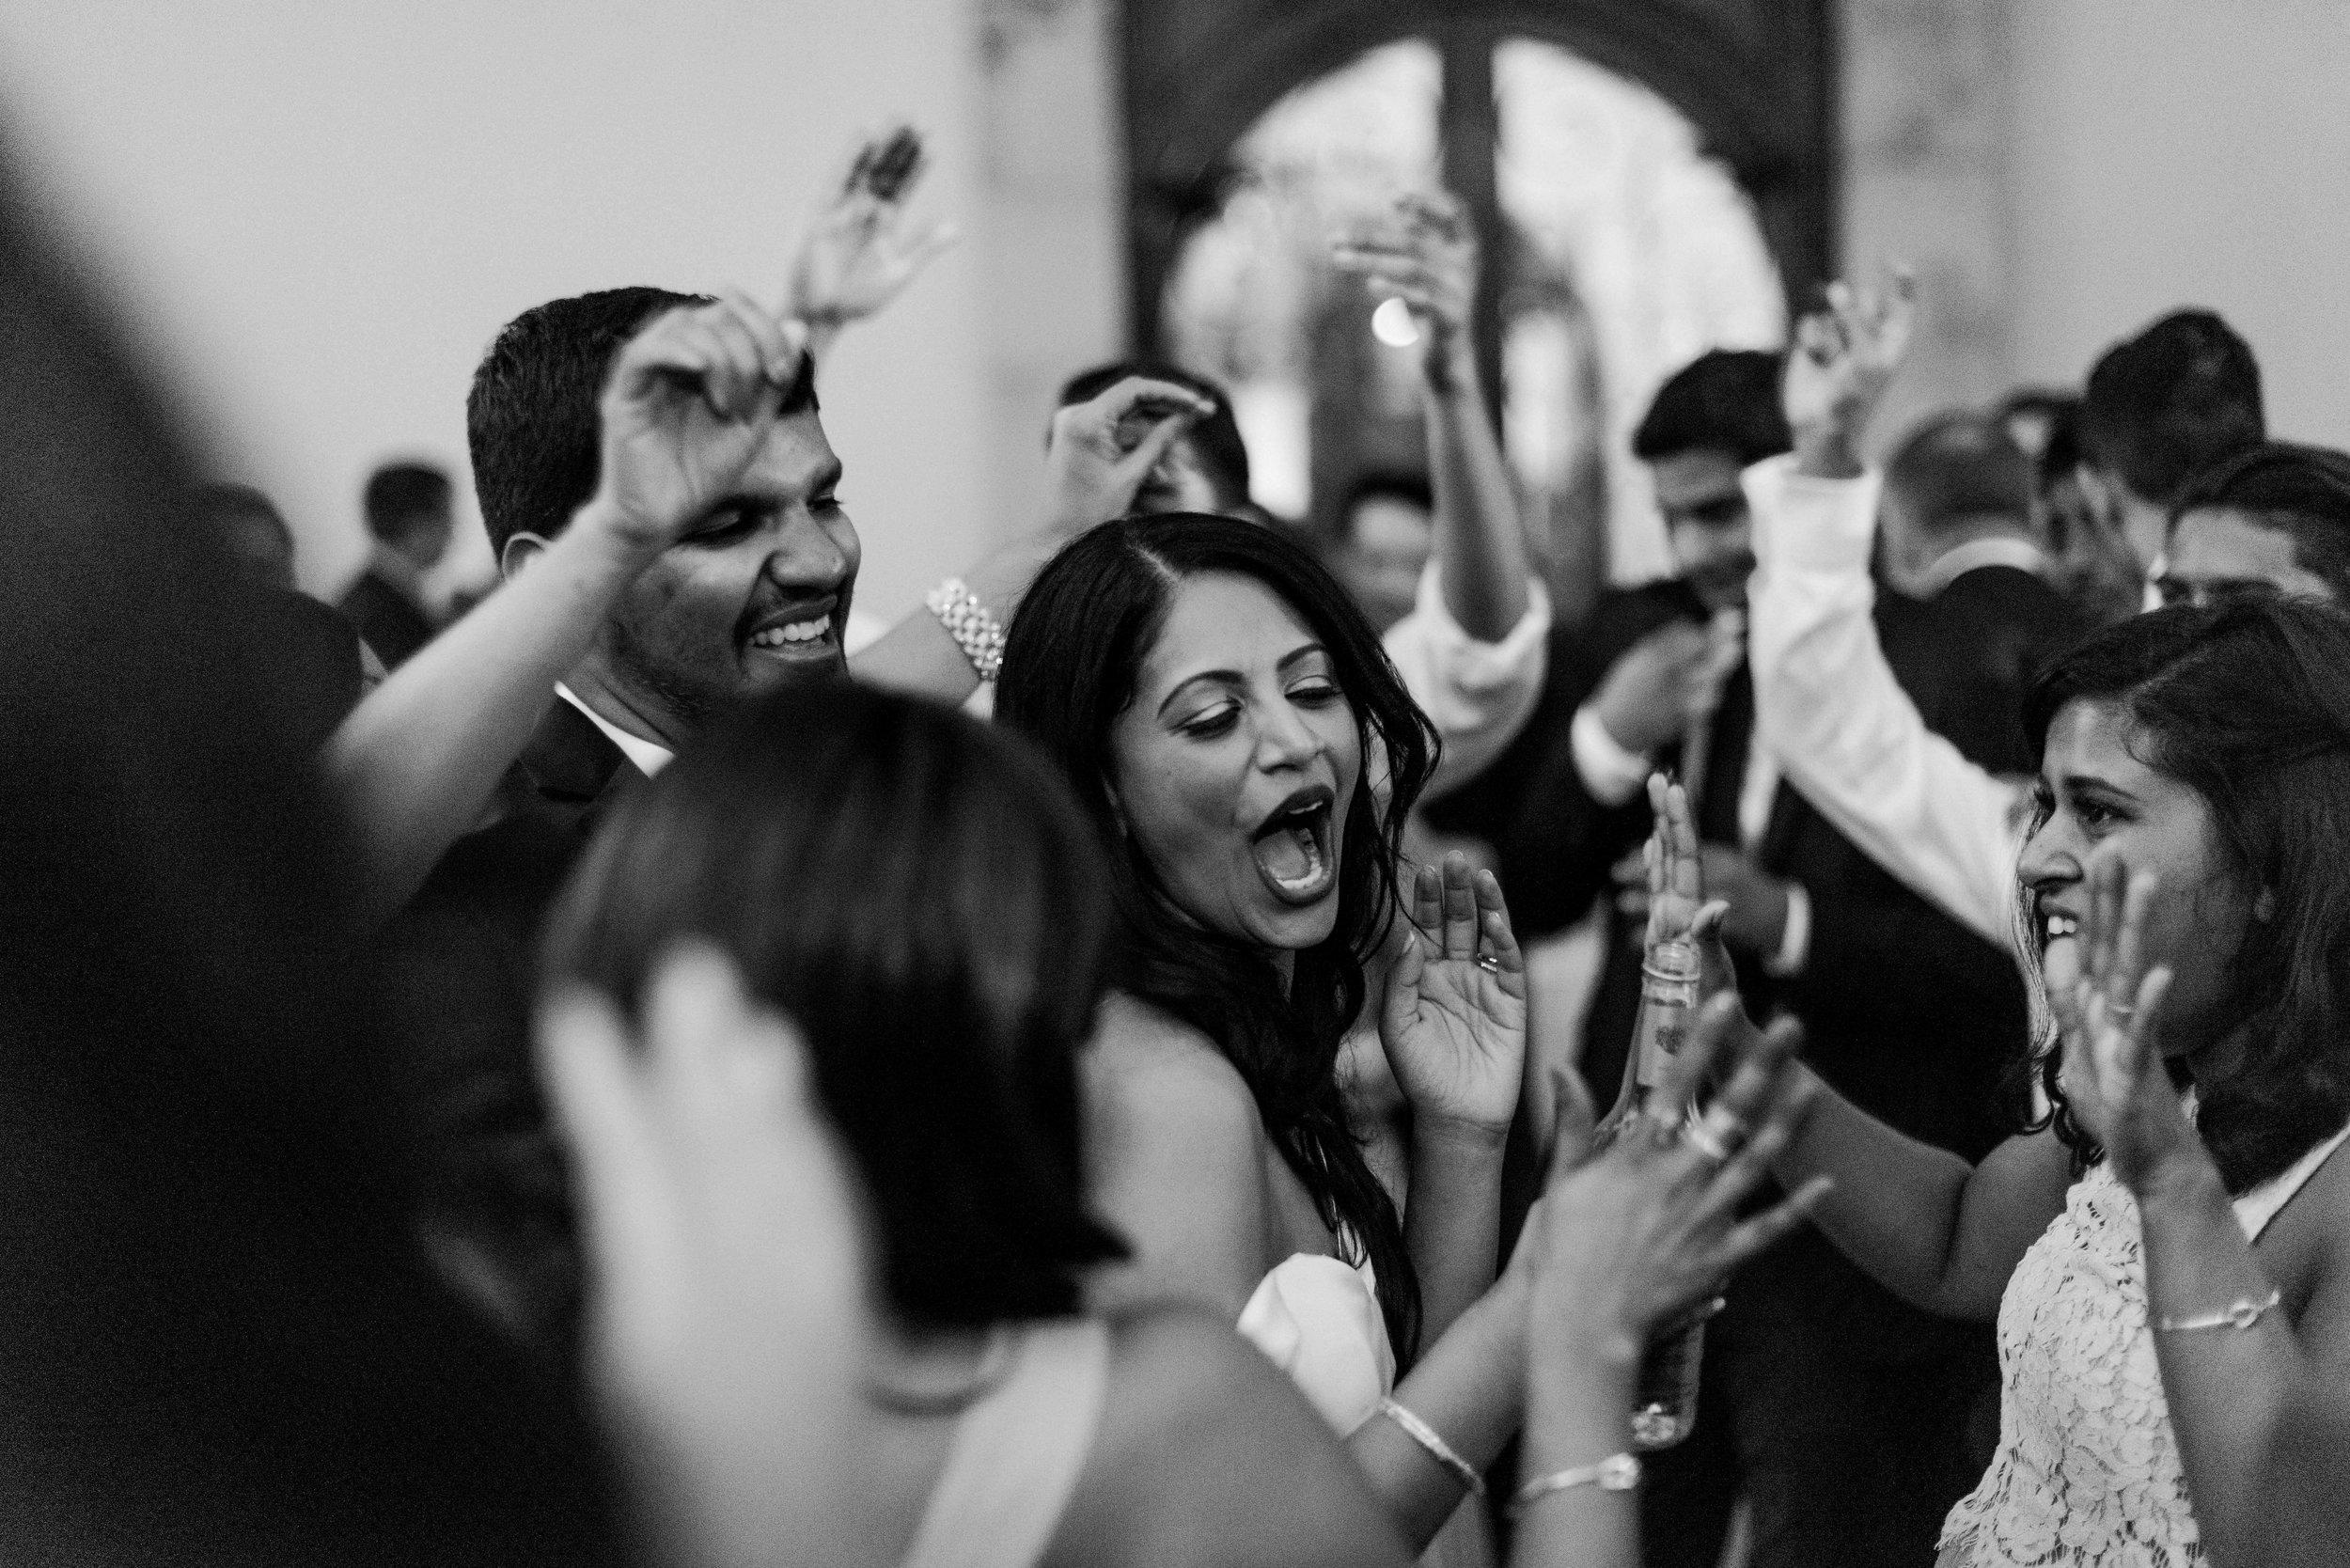 Fine-Art-Film-Houston-Wedding-Photographer-Best-Top-Luxury-Texas-Austin-Dallas-Destination-Dana-Fernandez-Photography-The-Bell-Tower-on-34th-Indian-40.jpg